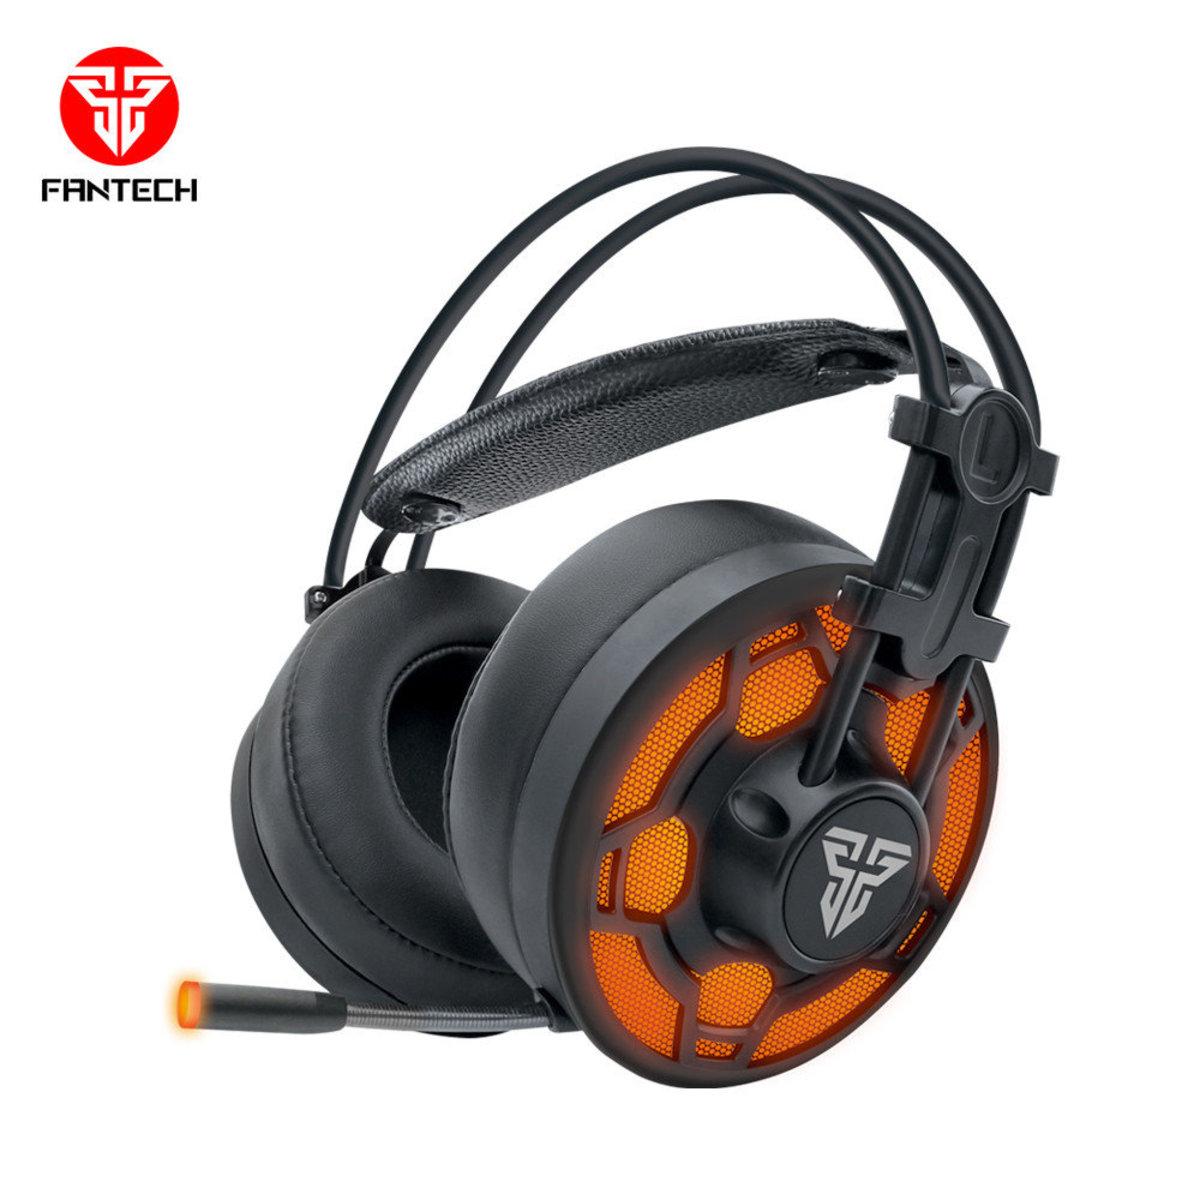 Fantech HG10 CAPTAIN 7.1 Gaming Headset